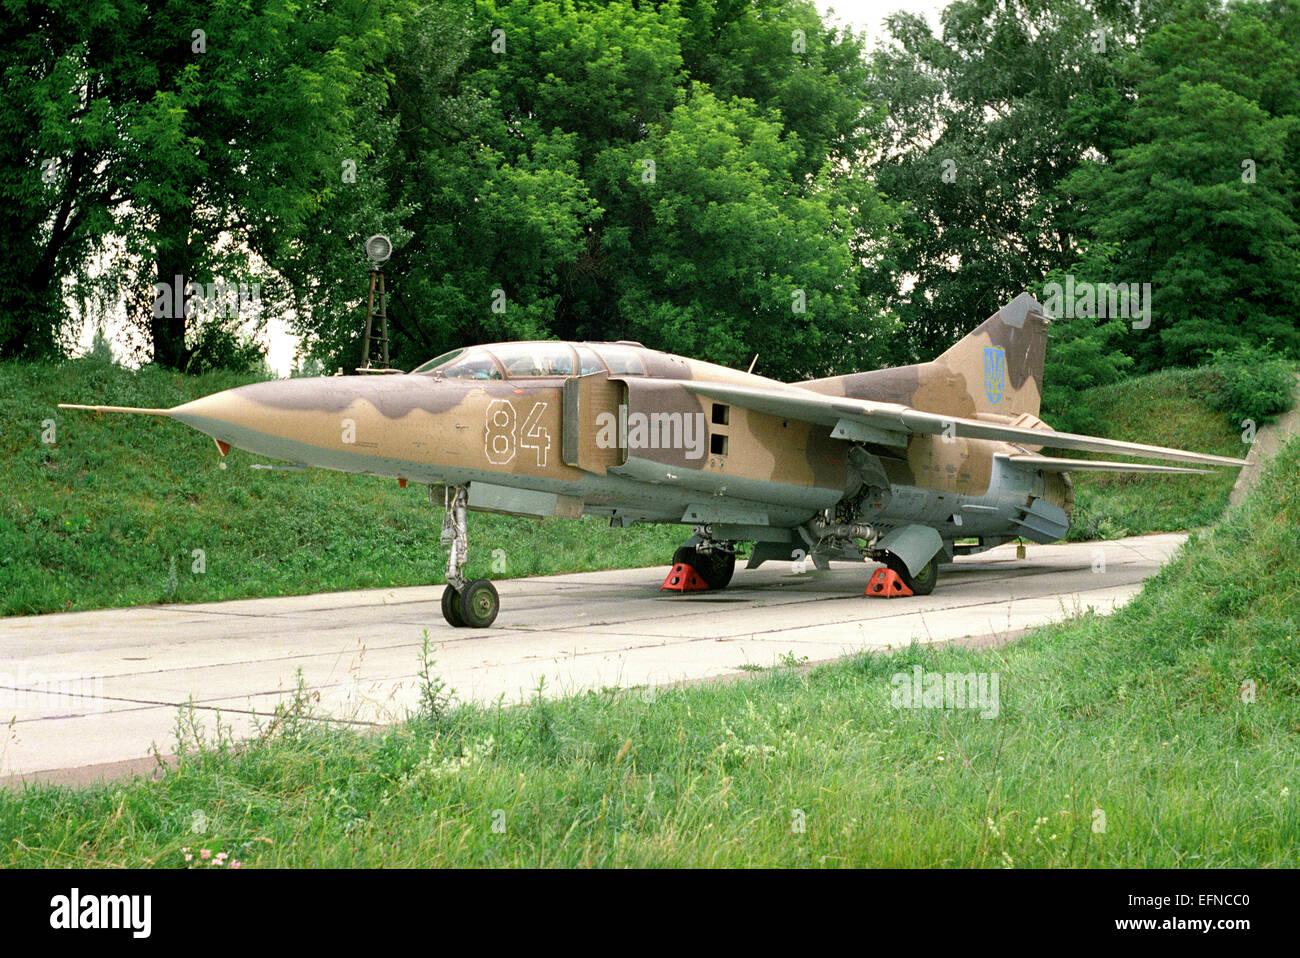 Combat training aircraft MiG-23 - Stock Image